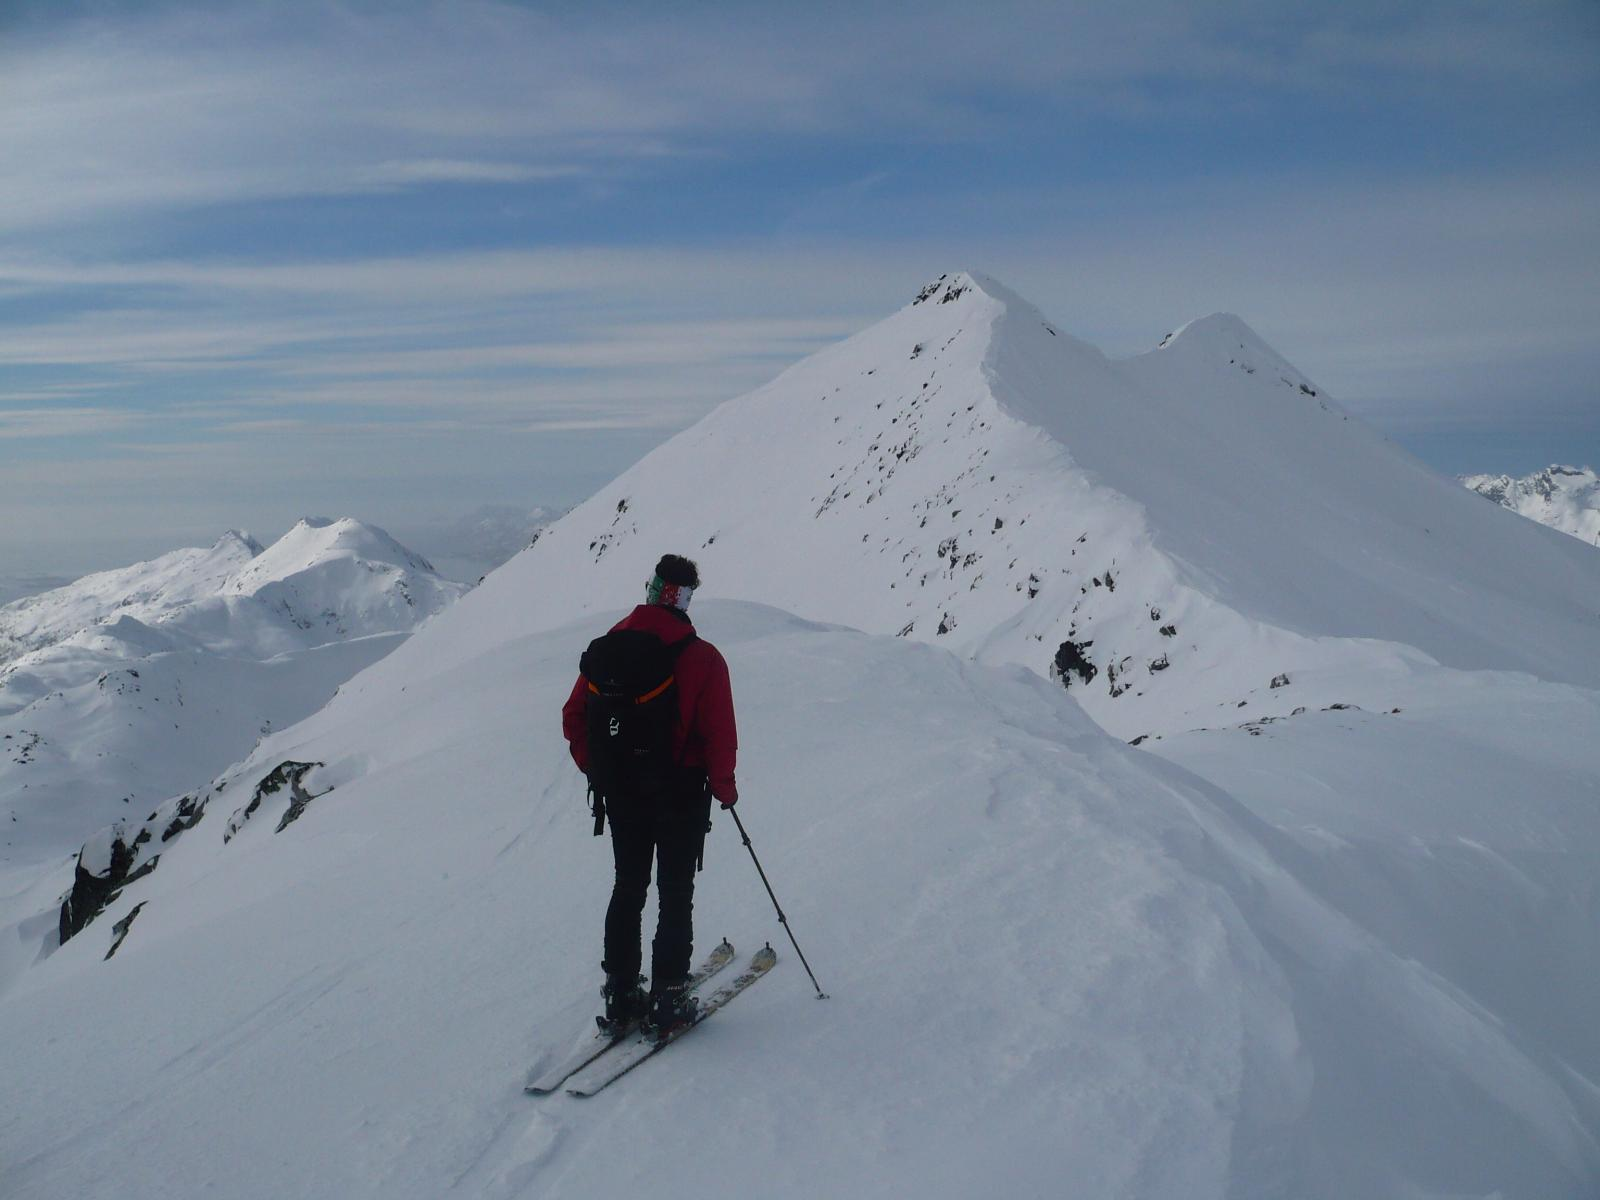 la cresta di salita vista da quota 754 m